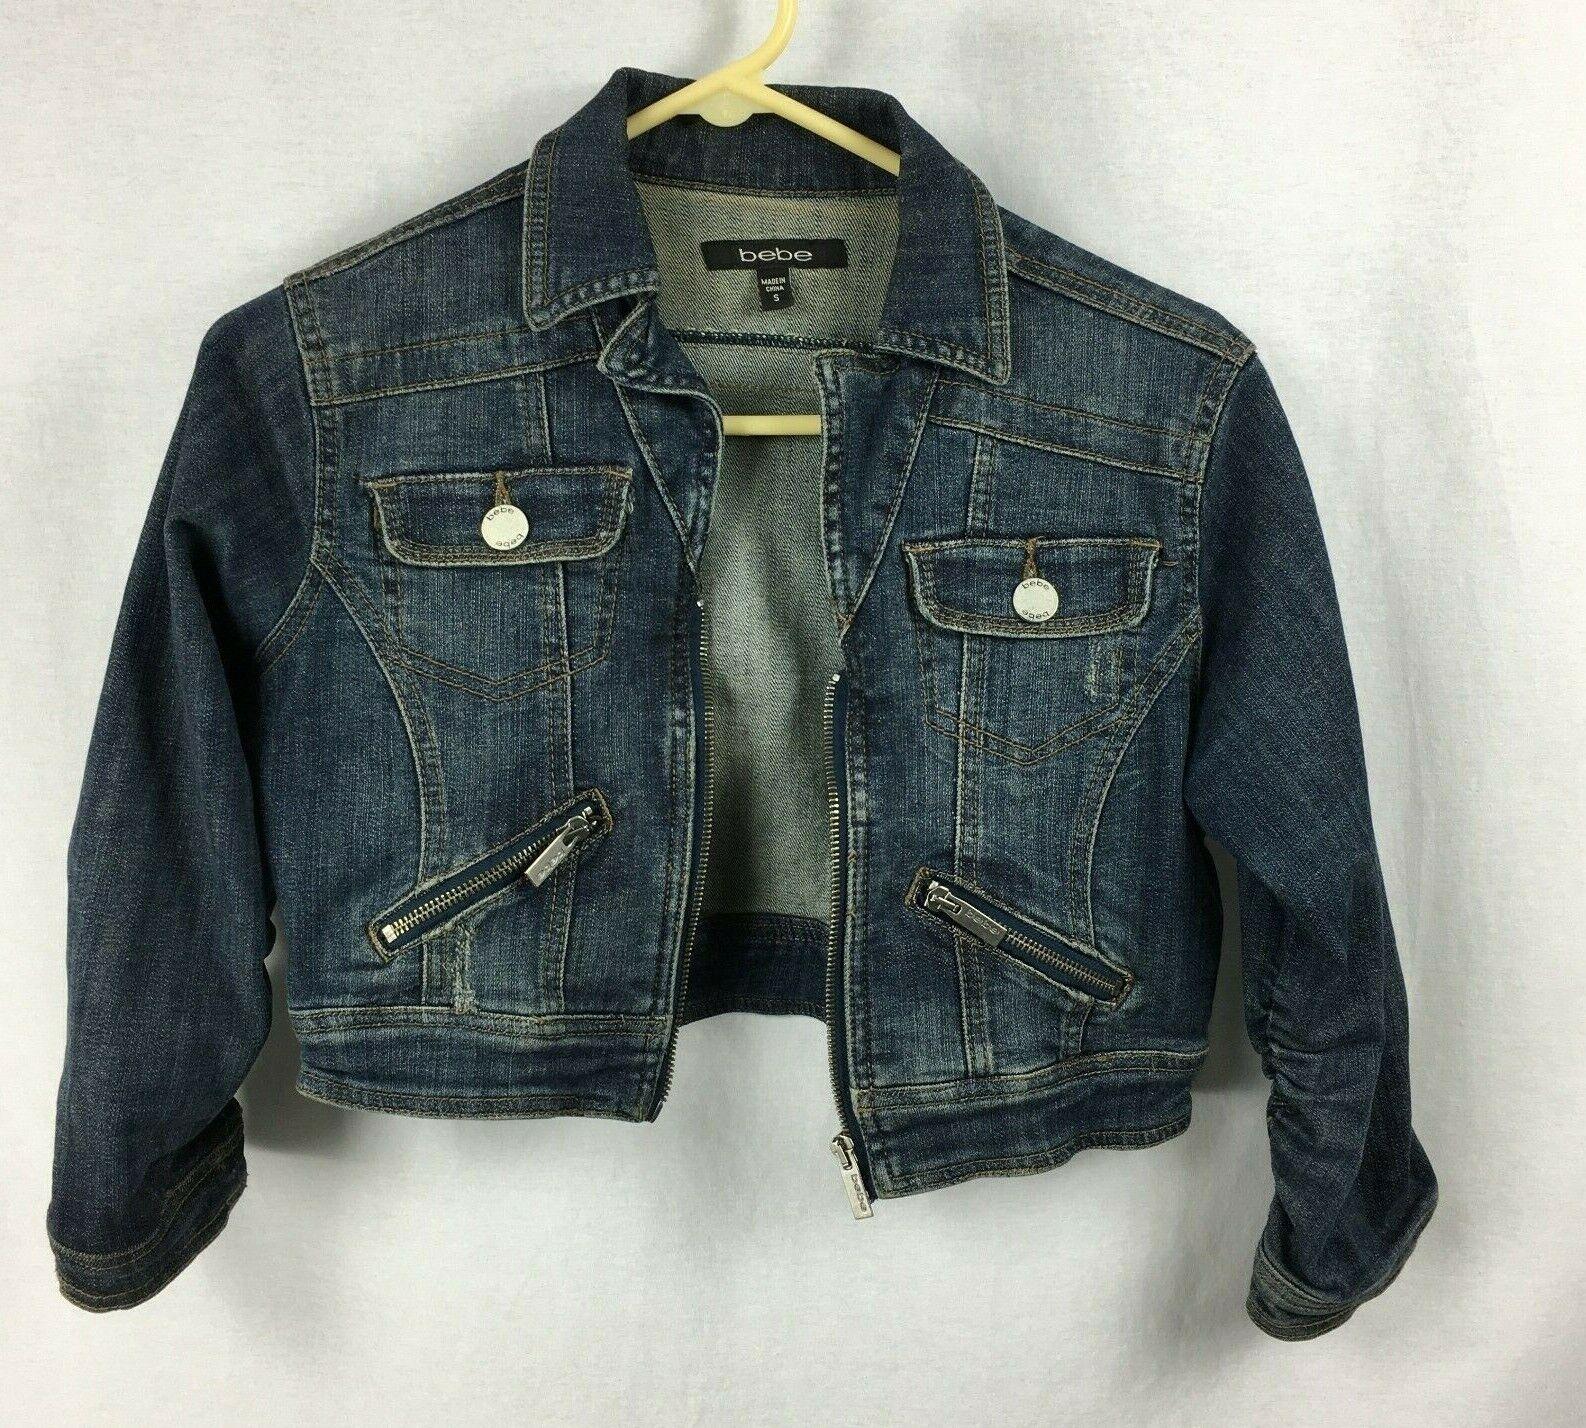 Bebe Cropped 3/4 Sleeve Ruched Sleeve Dark Denim Jean Jacket Size Small